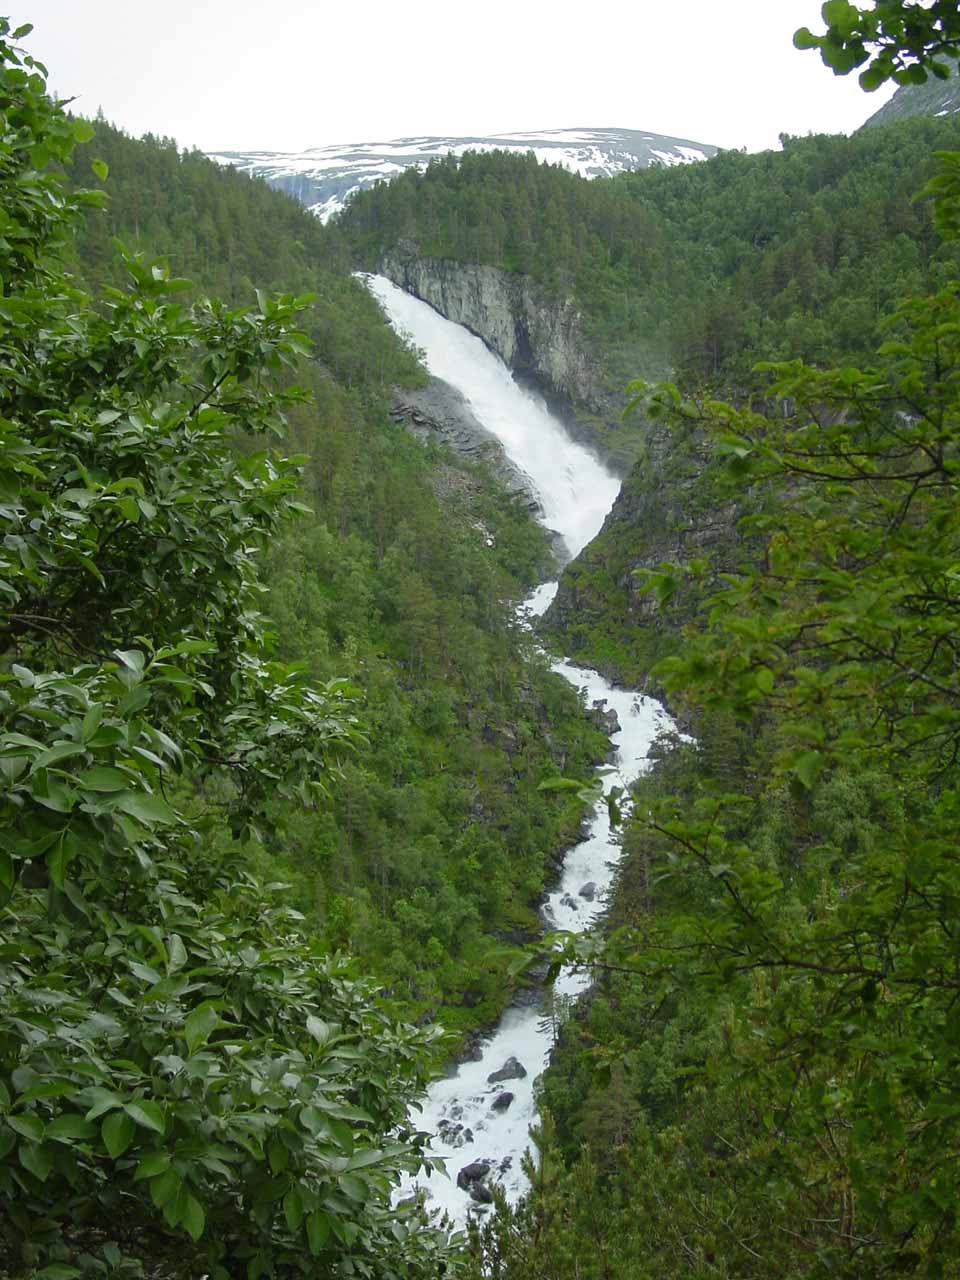 I started to get more frontal views of Reppdalsfossen (or Reppfossen) as I was hiking towards Svøufossen